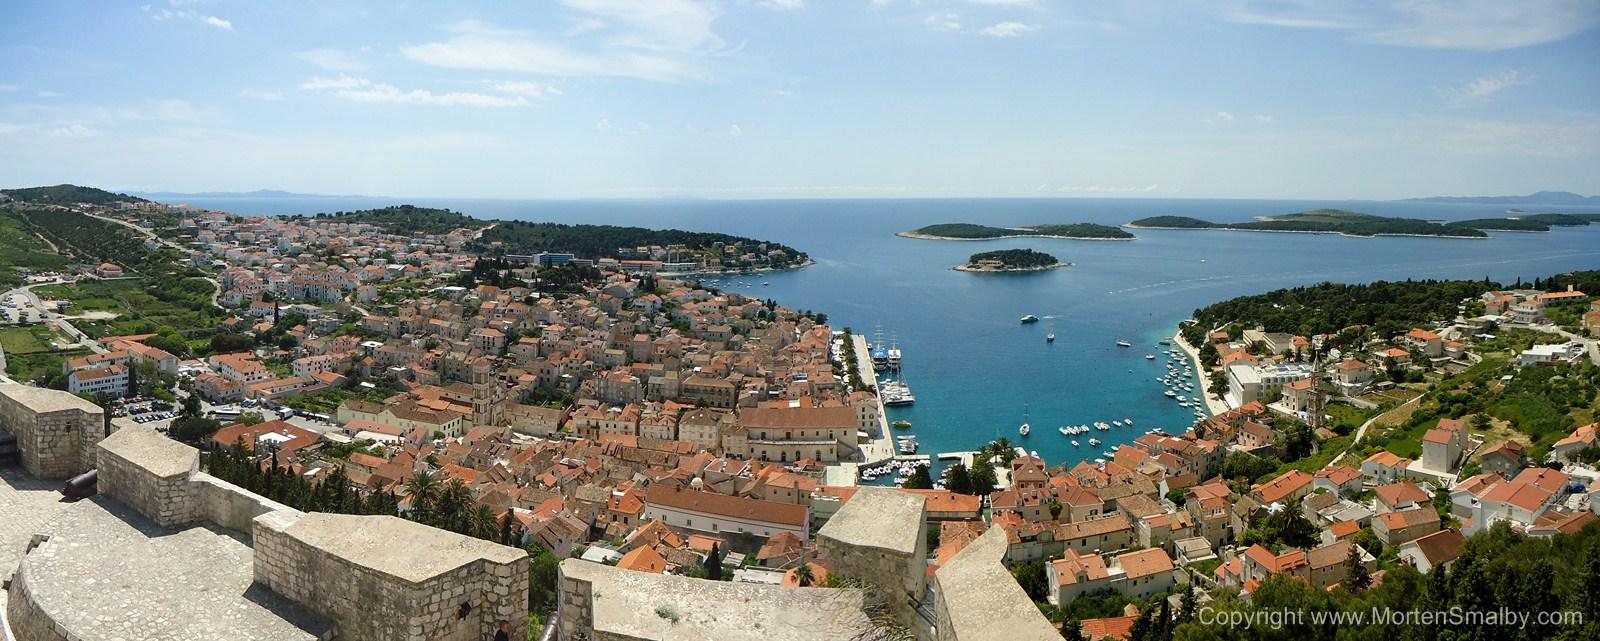 Town Hvar View